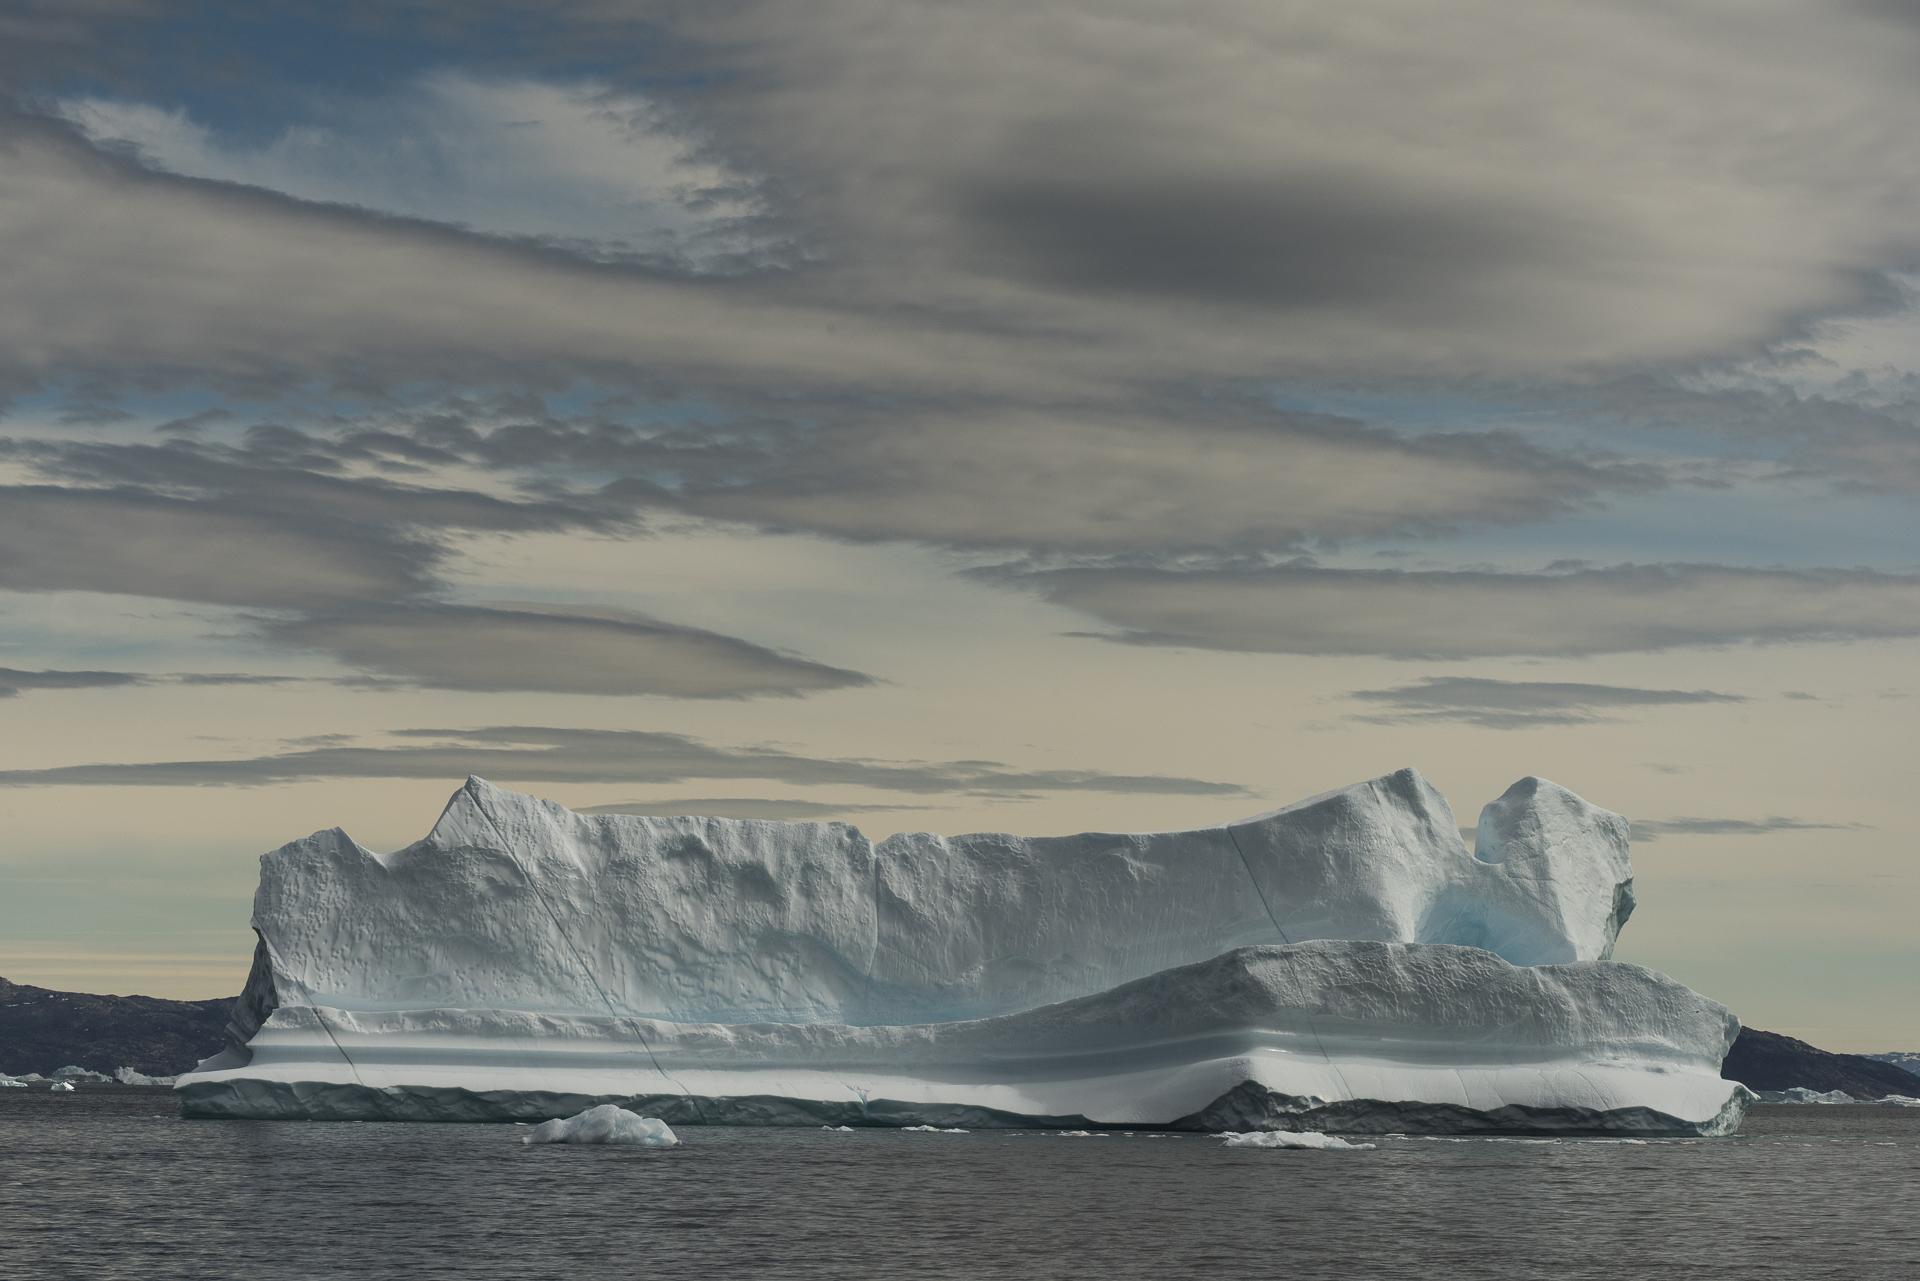 Defibaugh_Greenland_Uummannaq_b_36.jpg